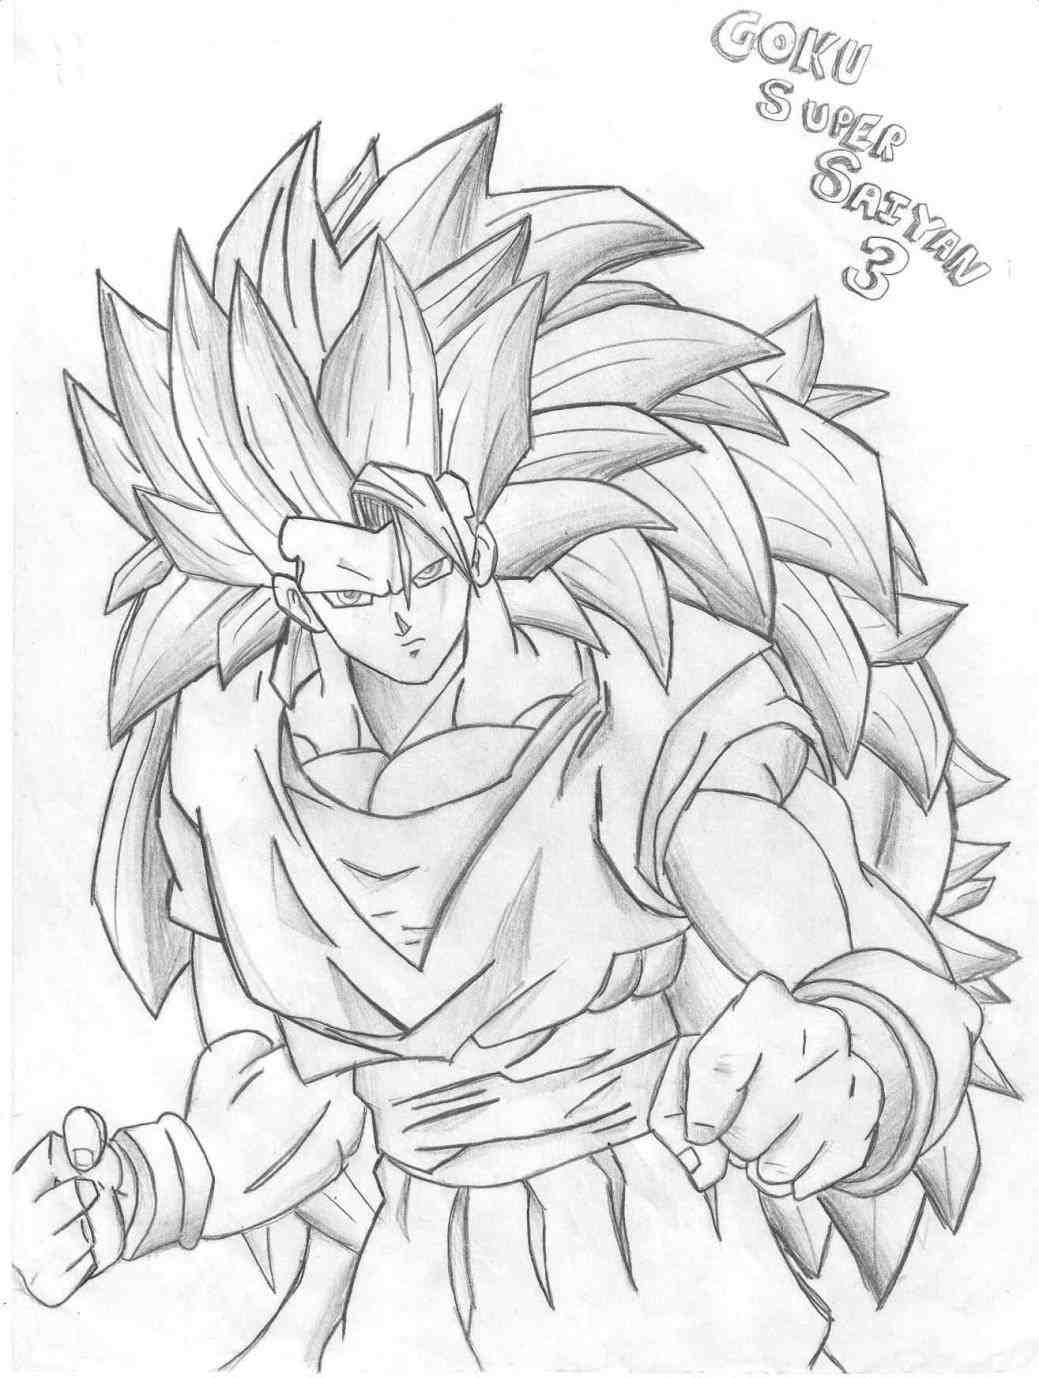 1039x1378 Pencil Zeichnen Dragon Goku Image Draw Ball Super Pencil Drawing